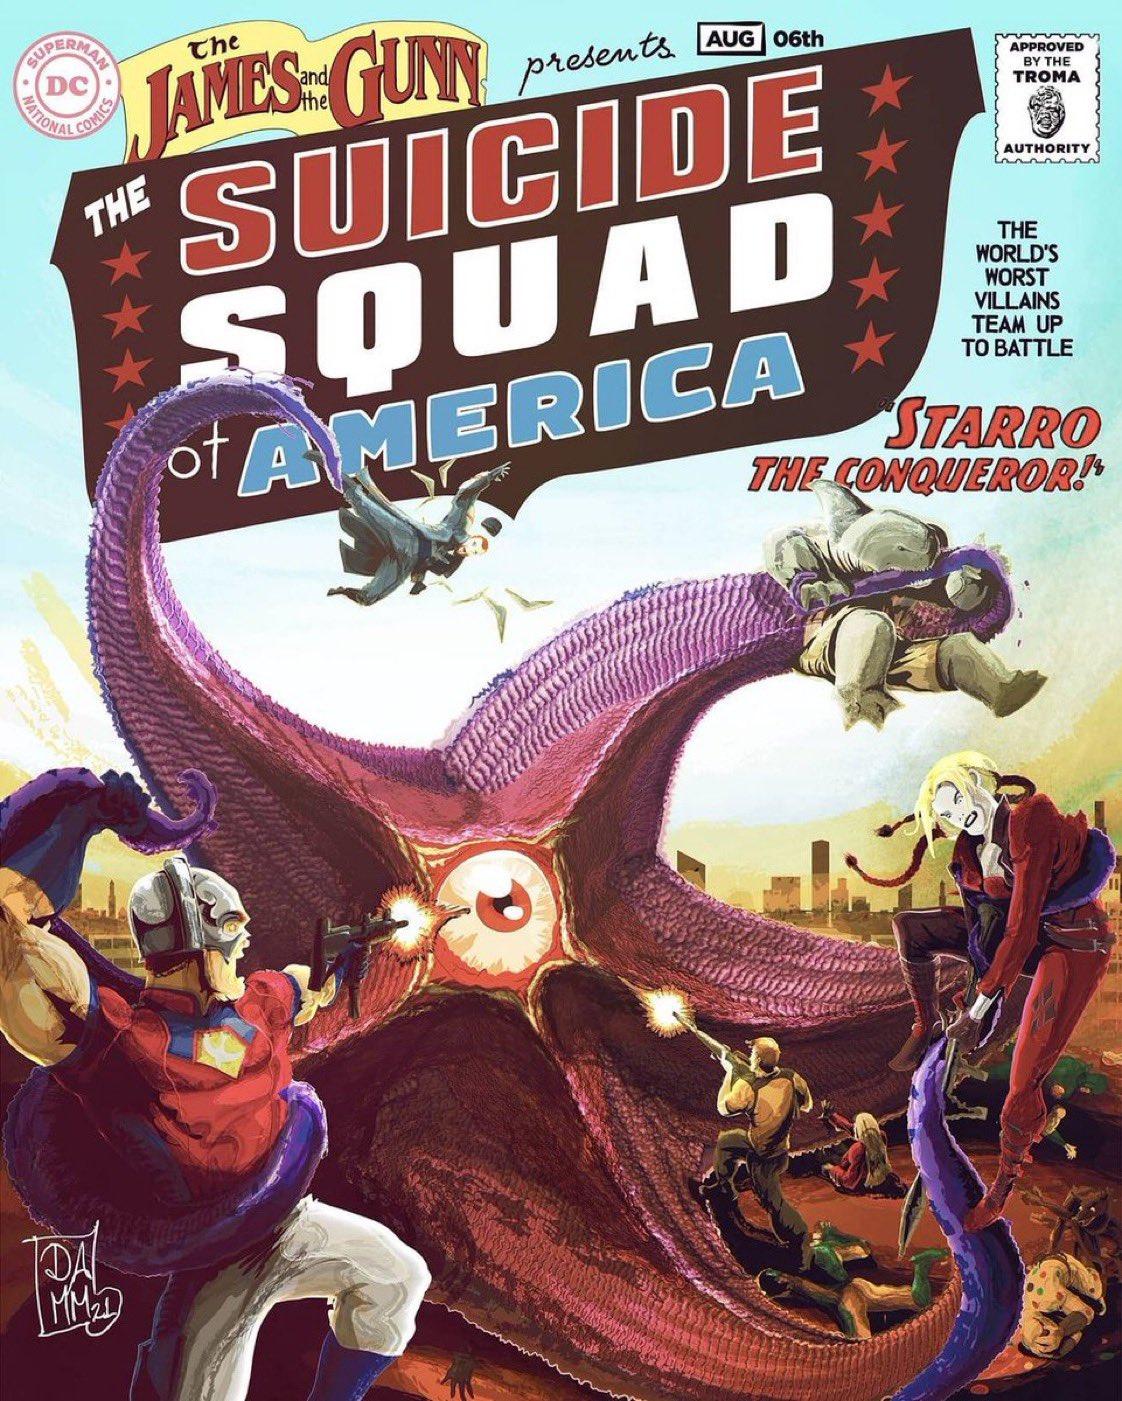 Legion samobójców. The Suicide Squad - plakat